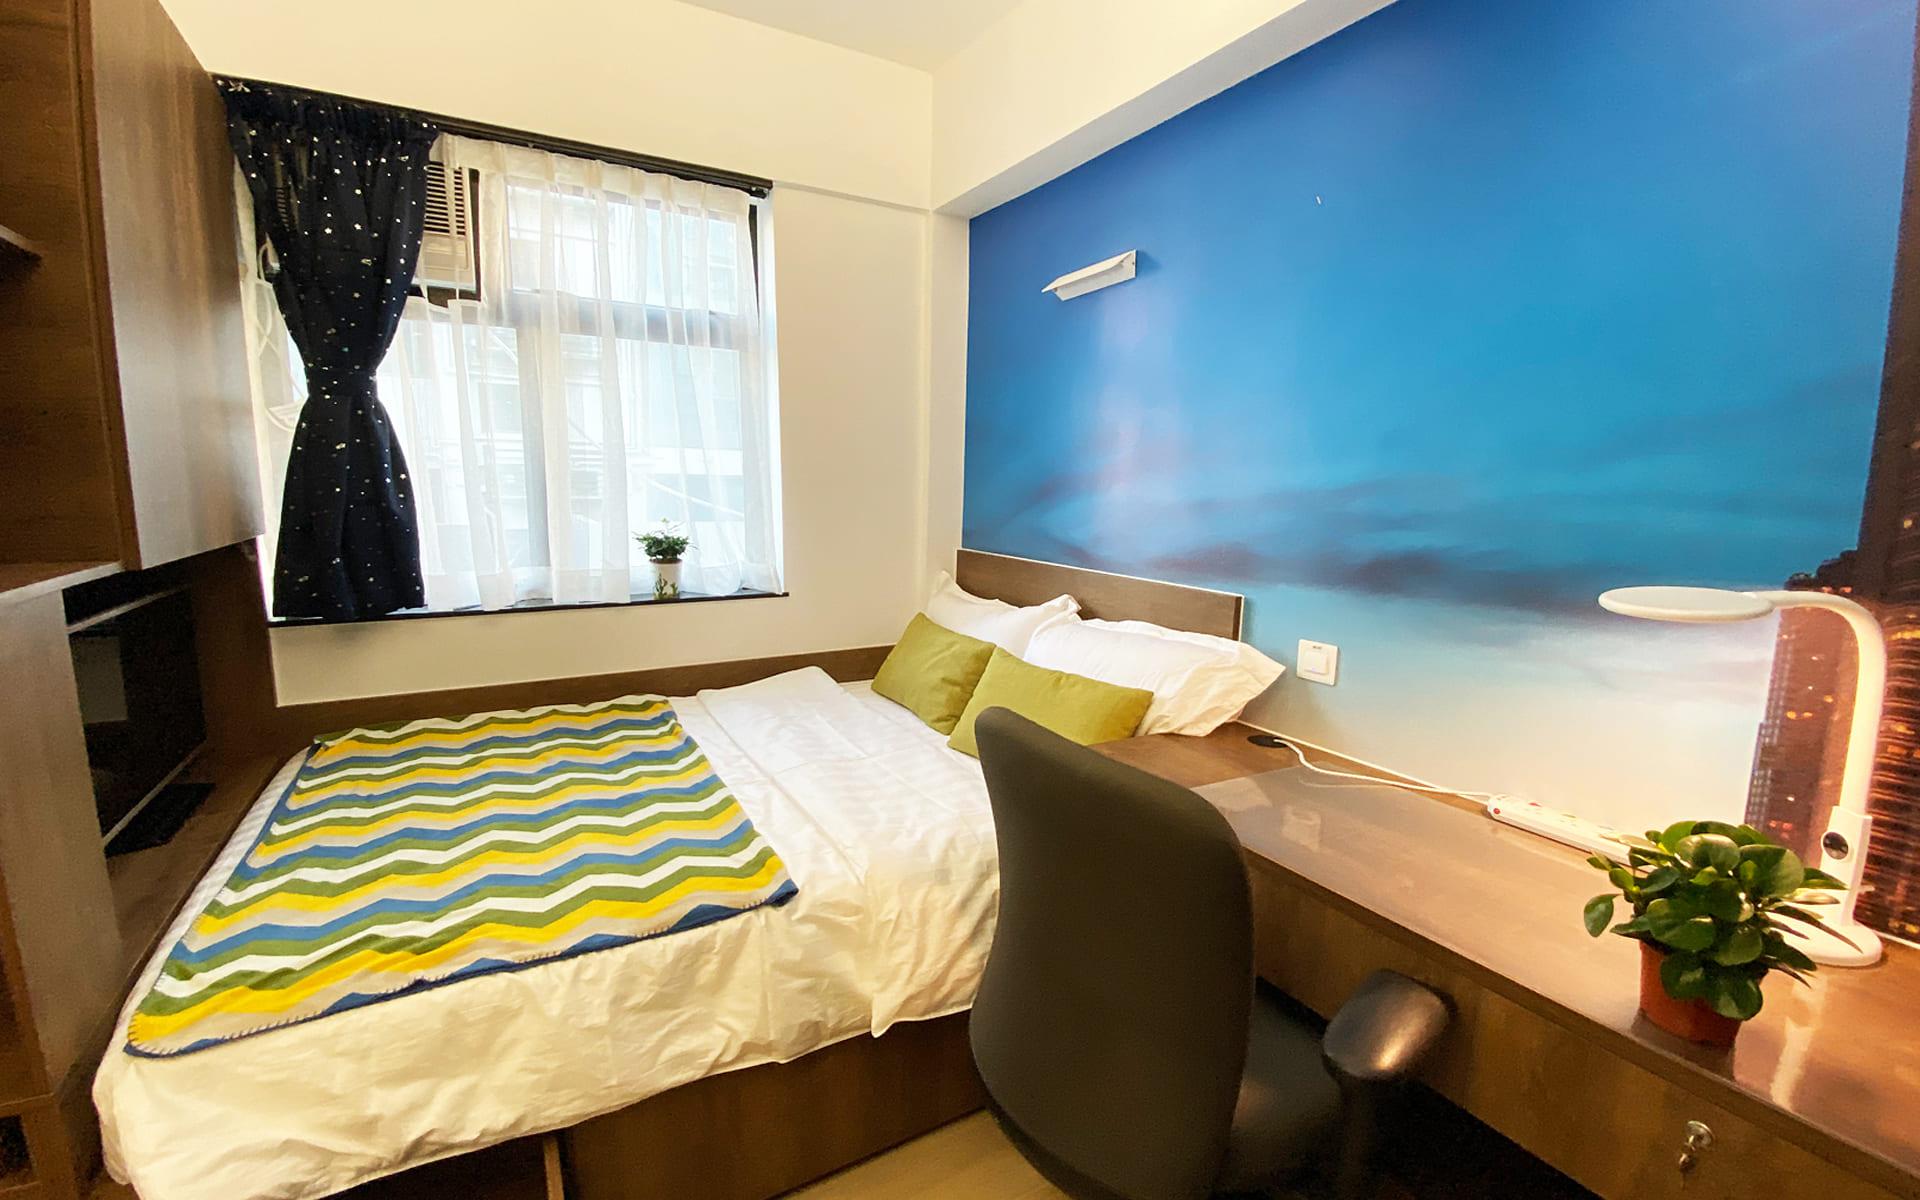 hk_service_apartment_8594797211596695916.jpg